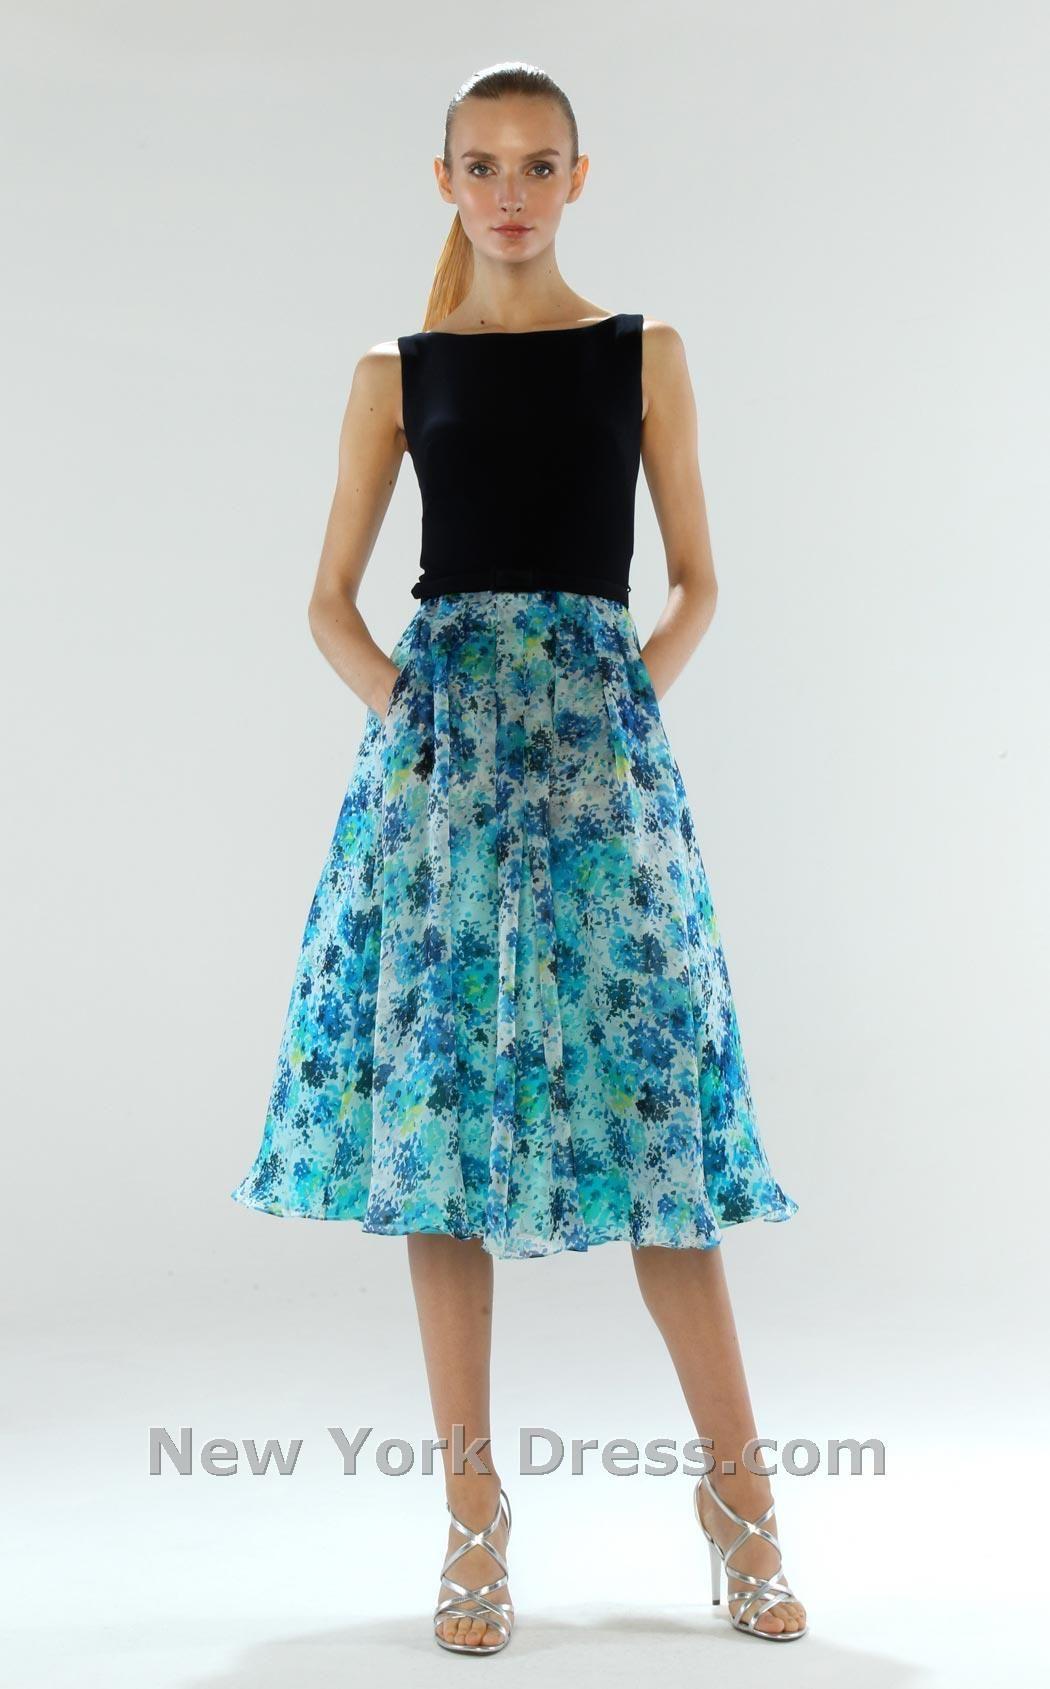 Lujoso Theia Cocktail Dresses Componente - Ideas de Estilos de ...